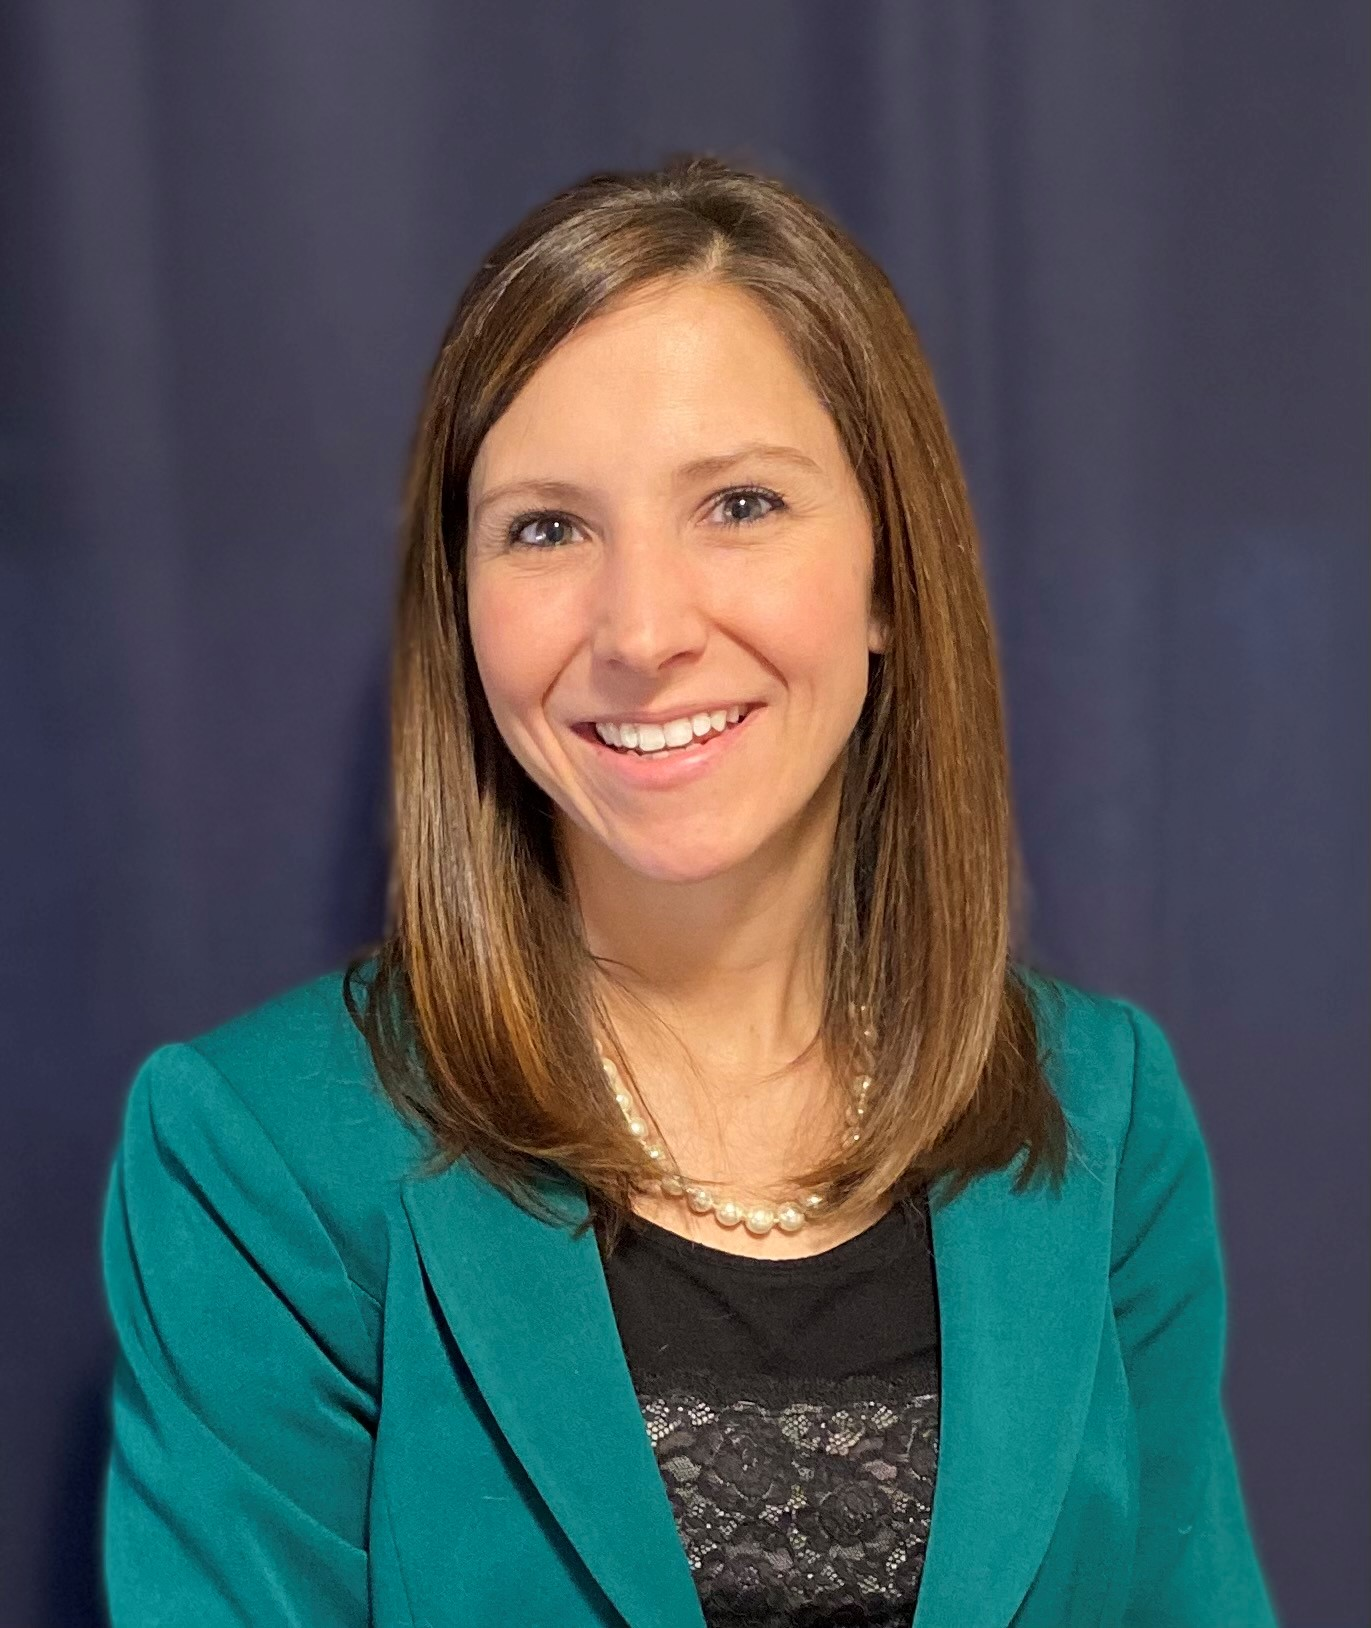 Kimberly Schwind